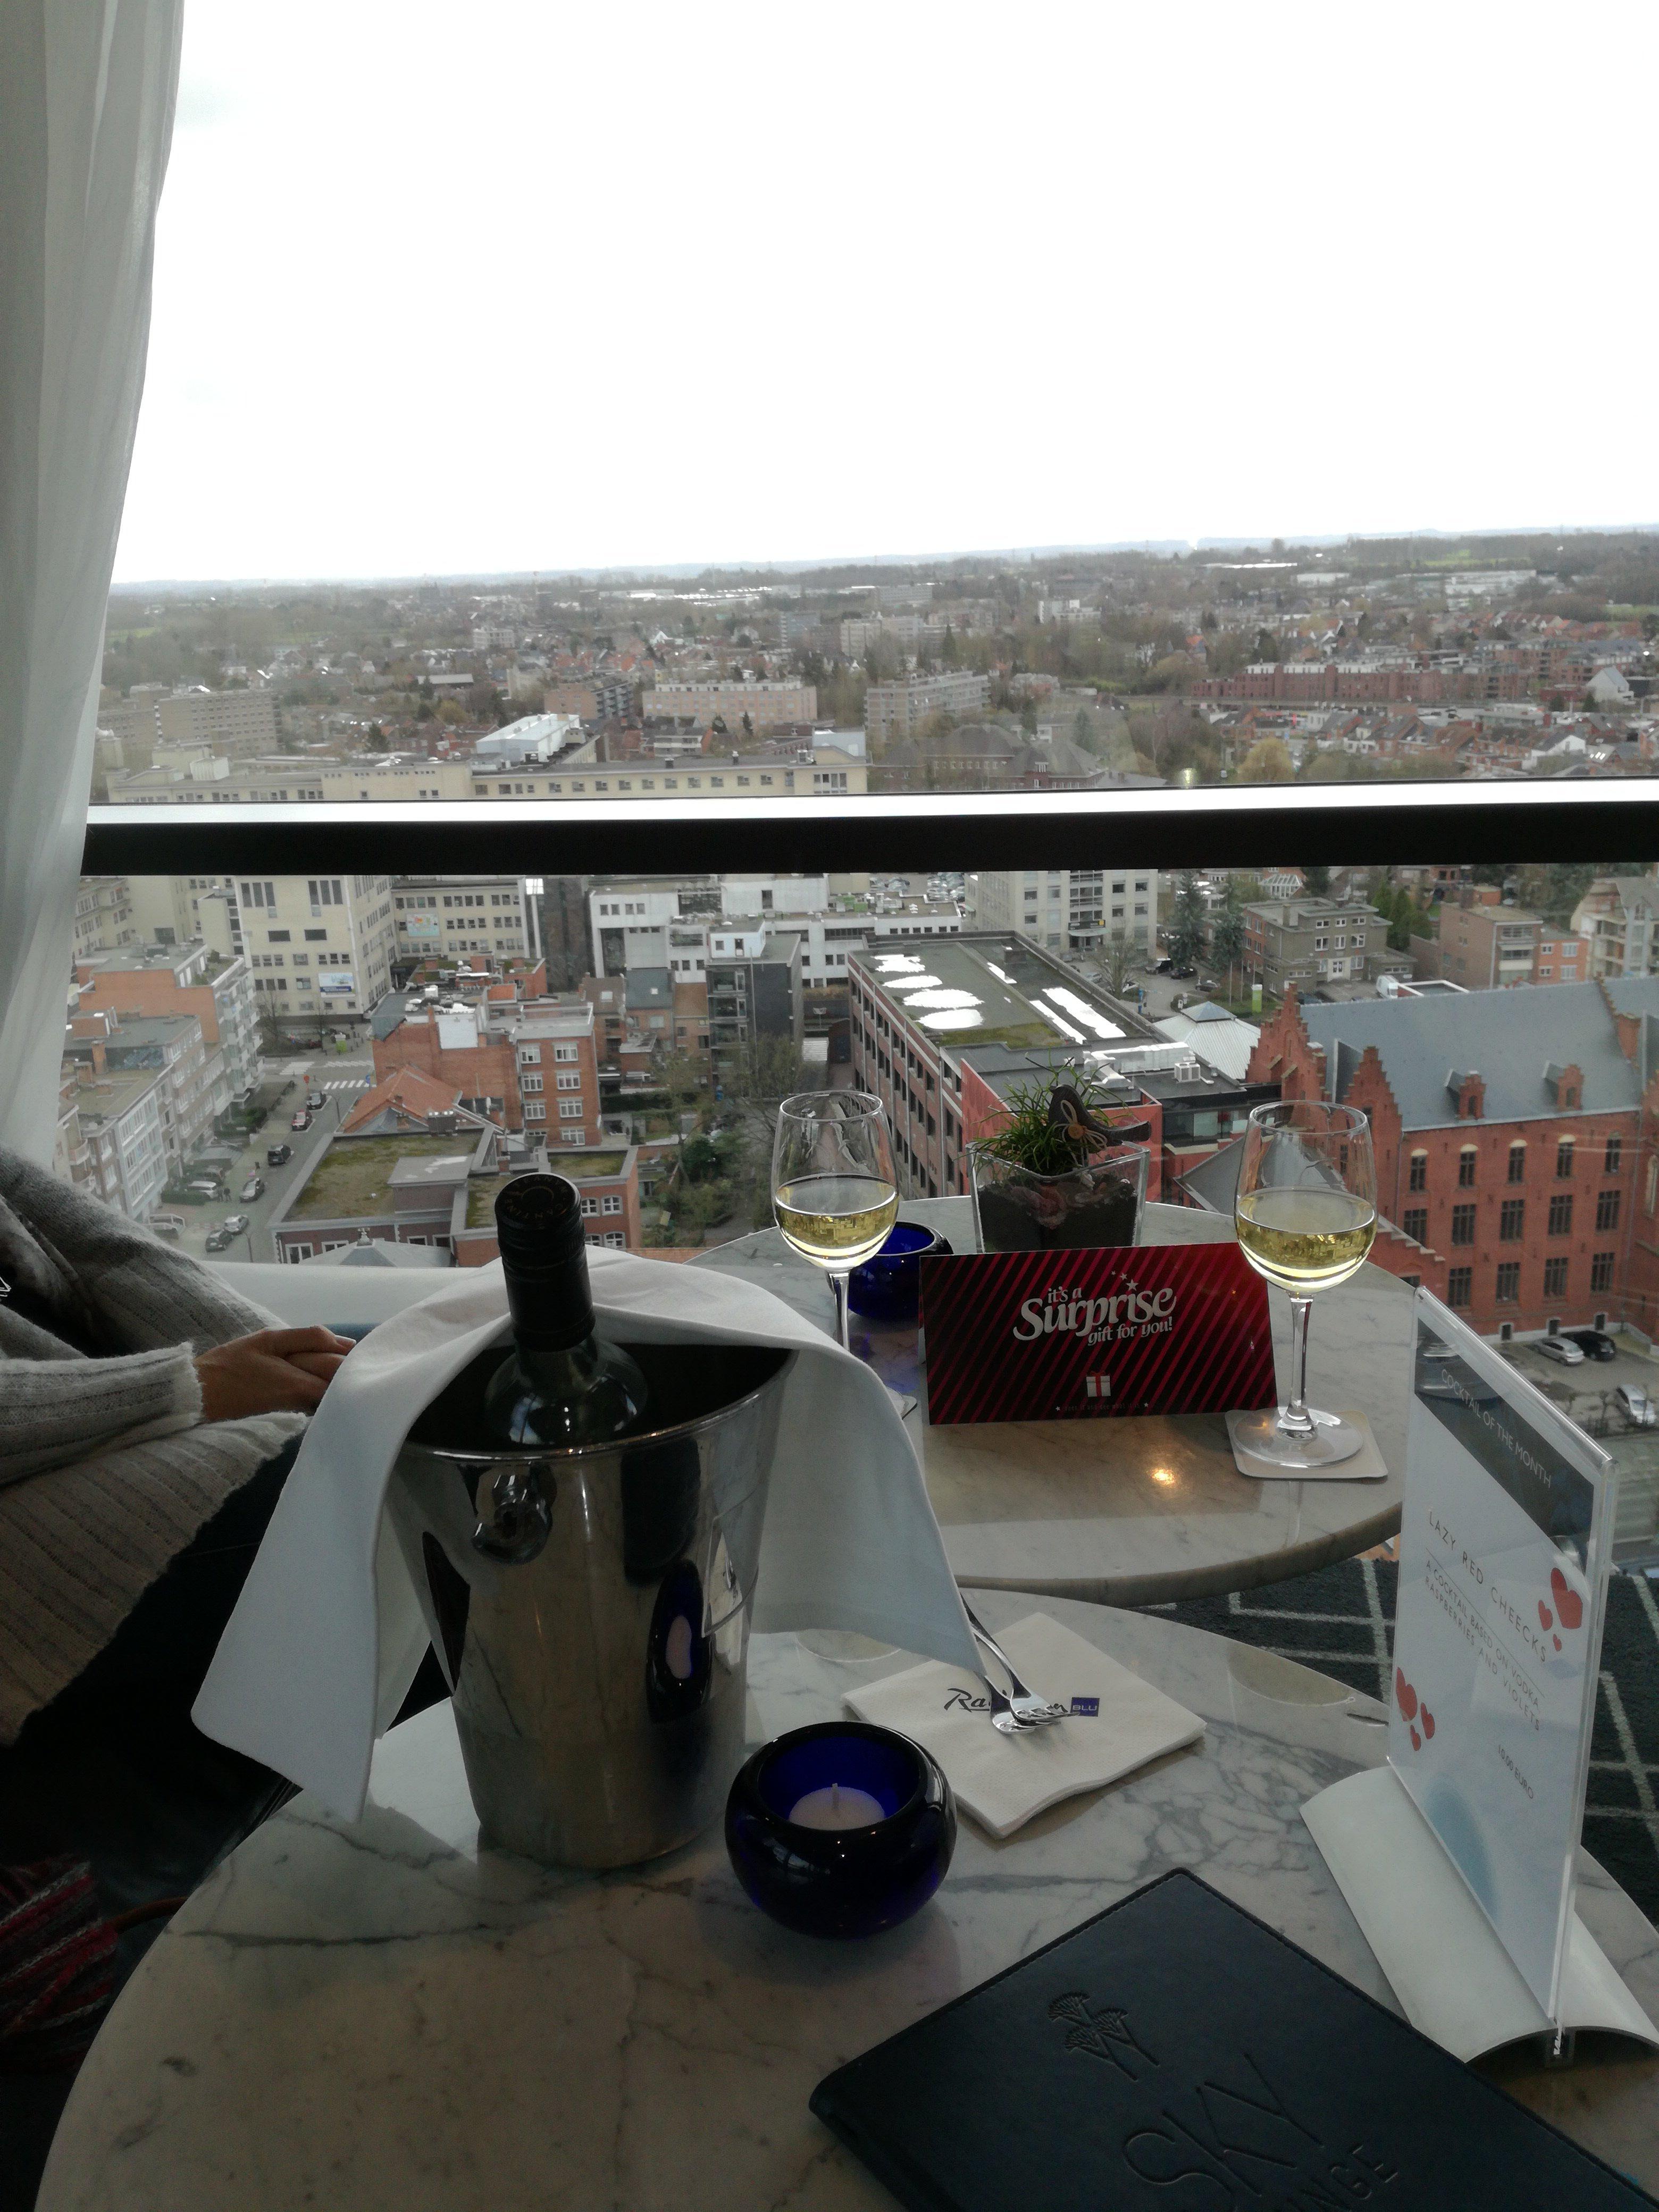 Sky lounge hasselt restaurantbeoordelingen tripadvisor - Scheiding ingang lounge ...